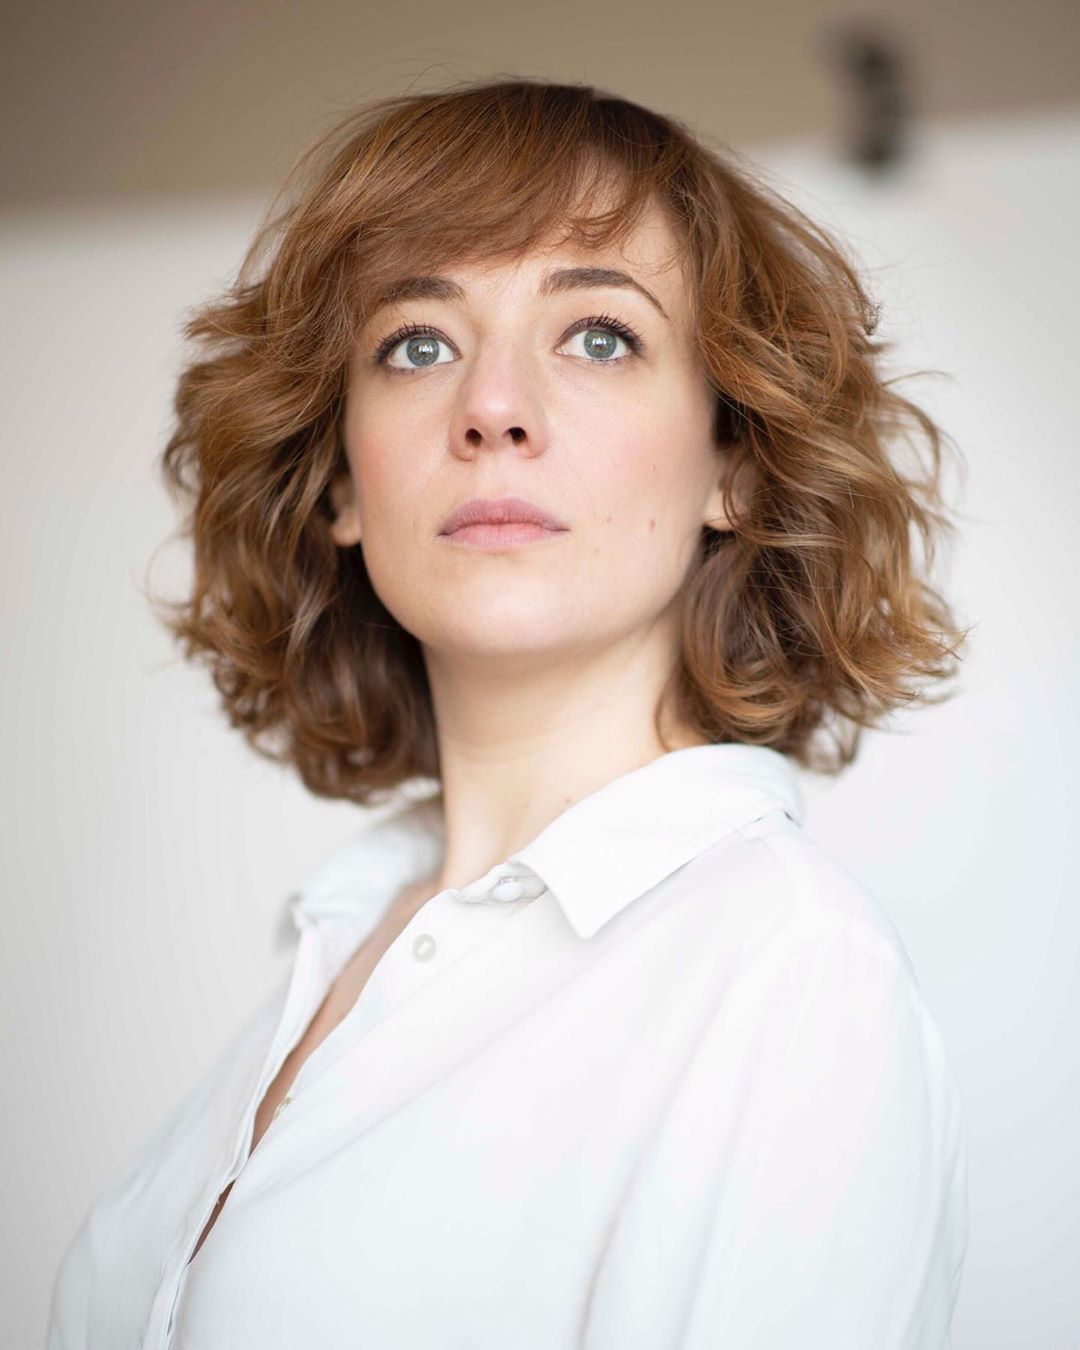 Sara Lazzaro